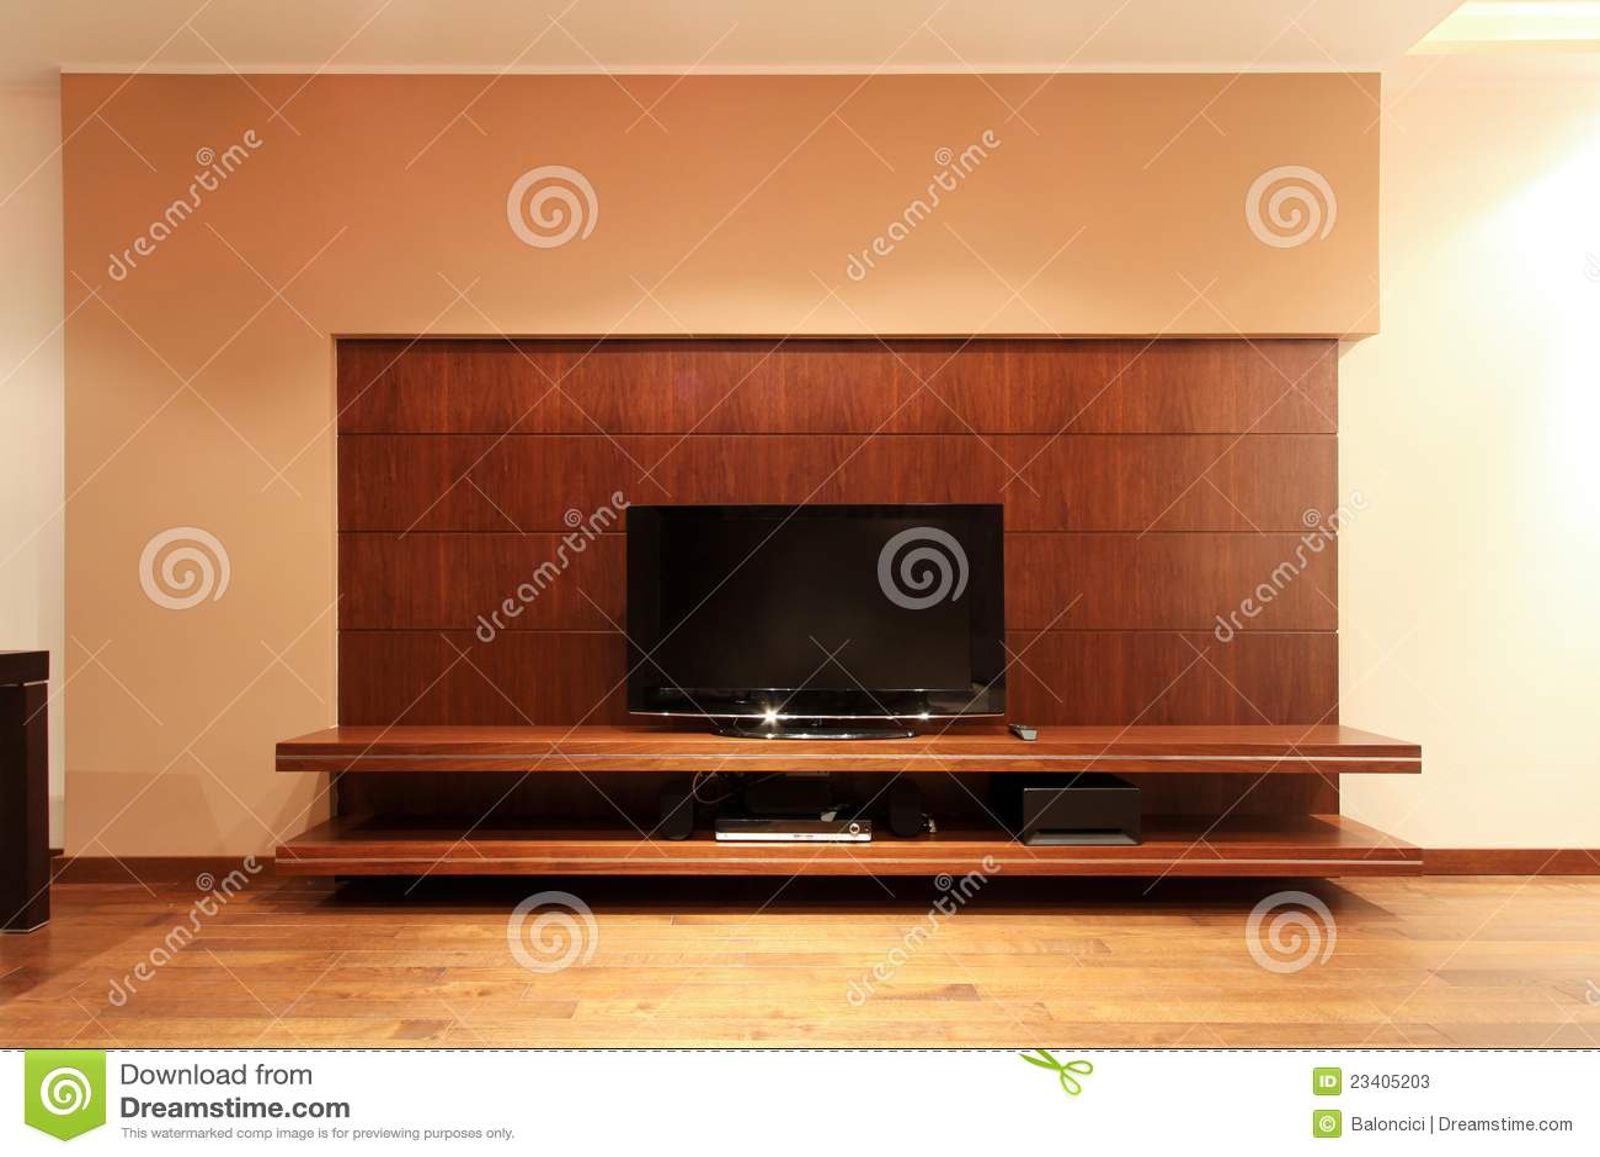 Permalink to wooden shelf design plans